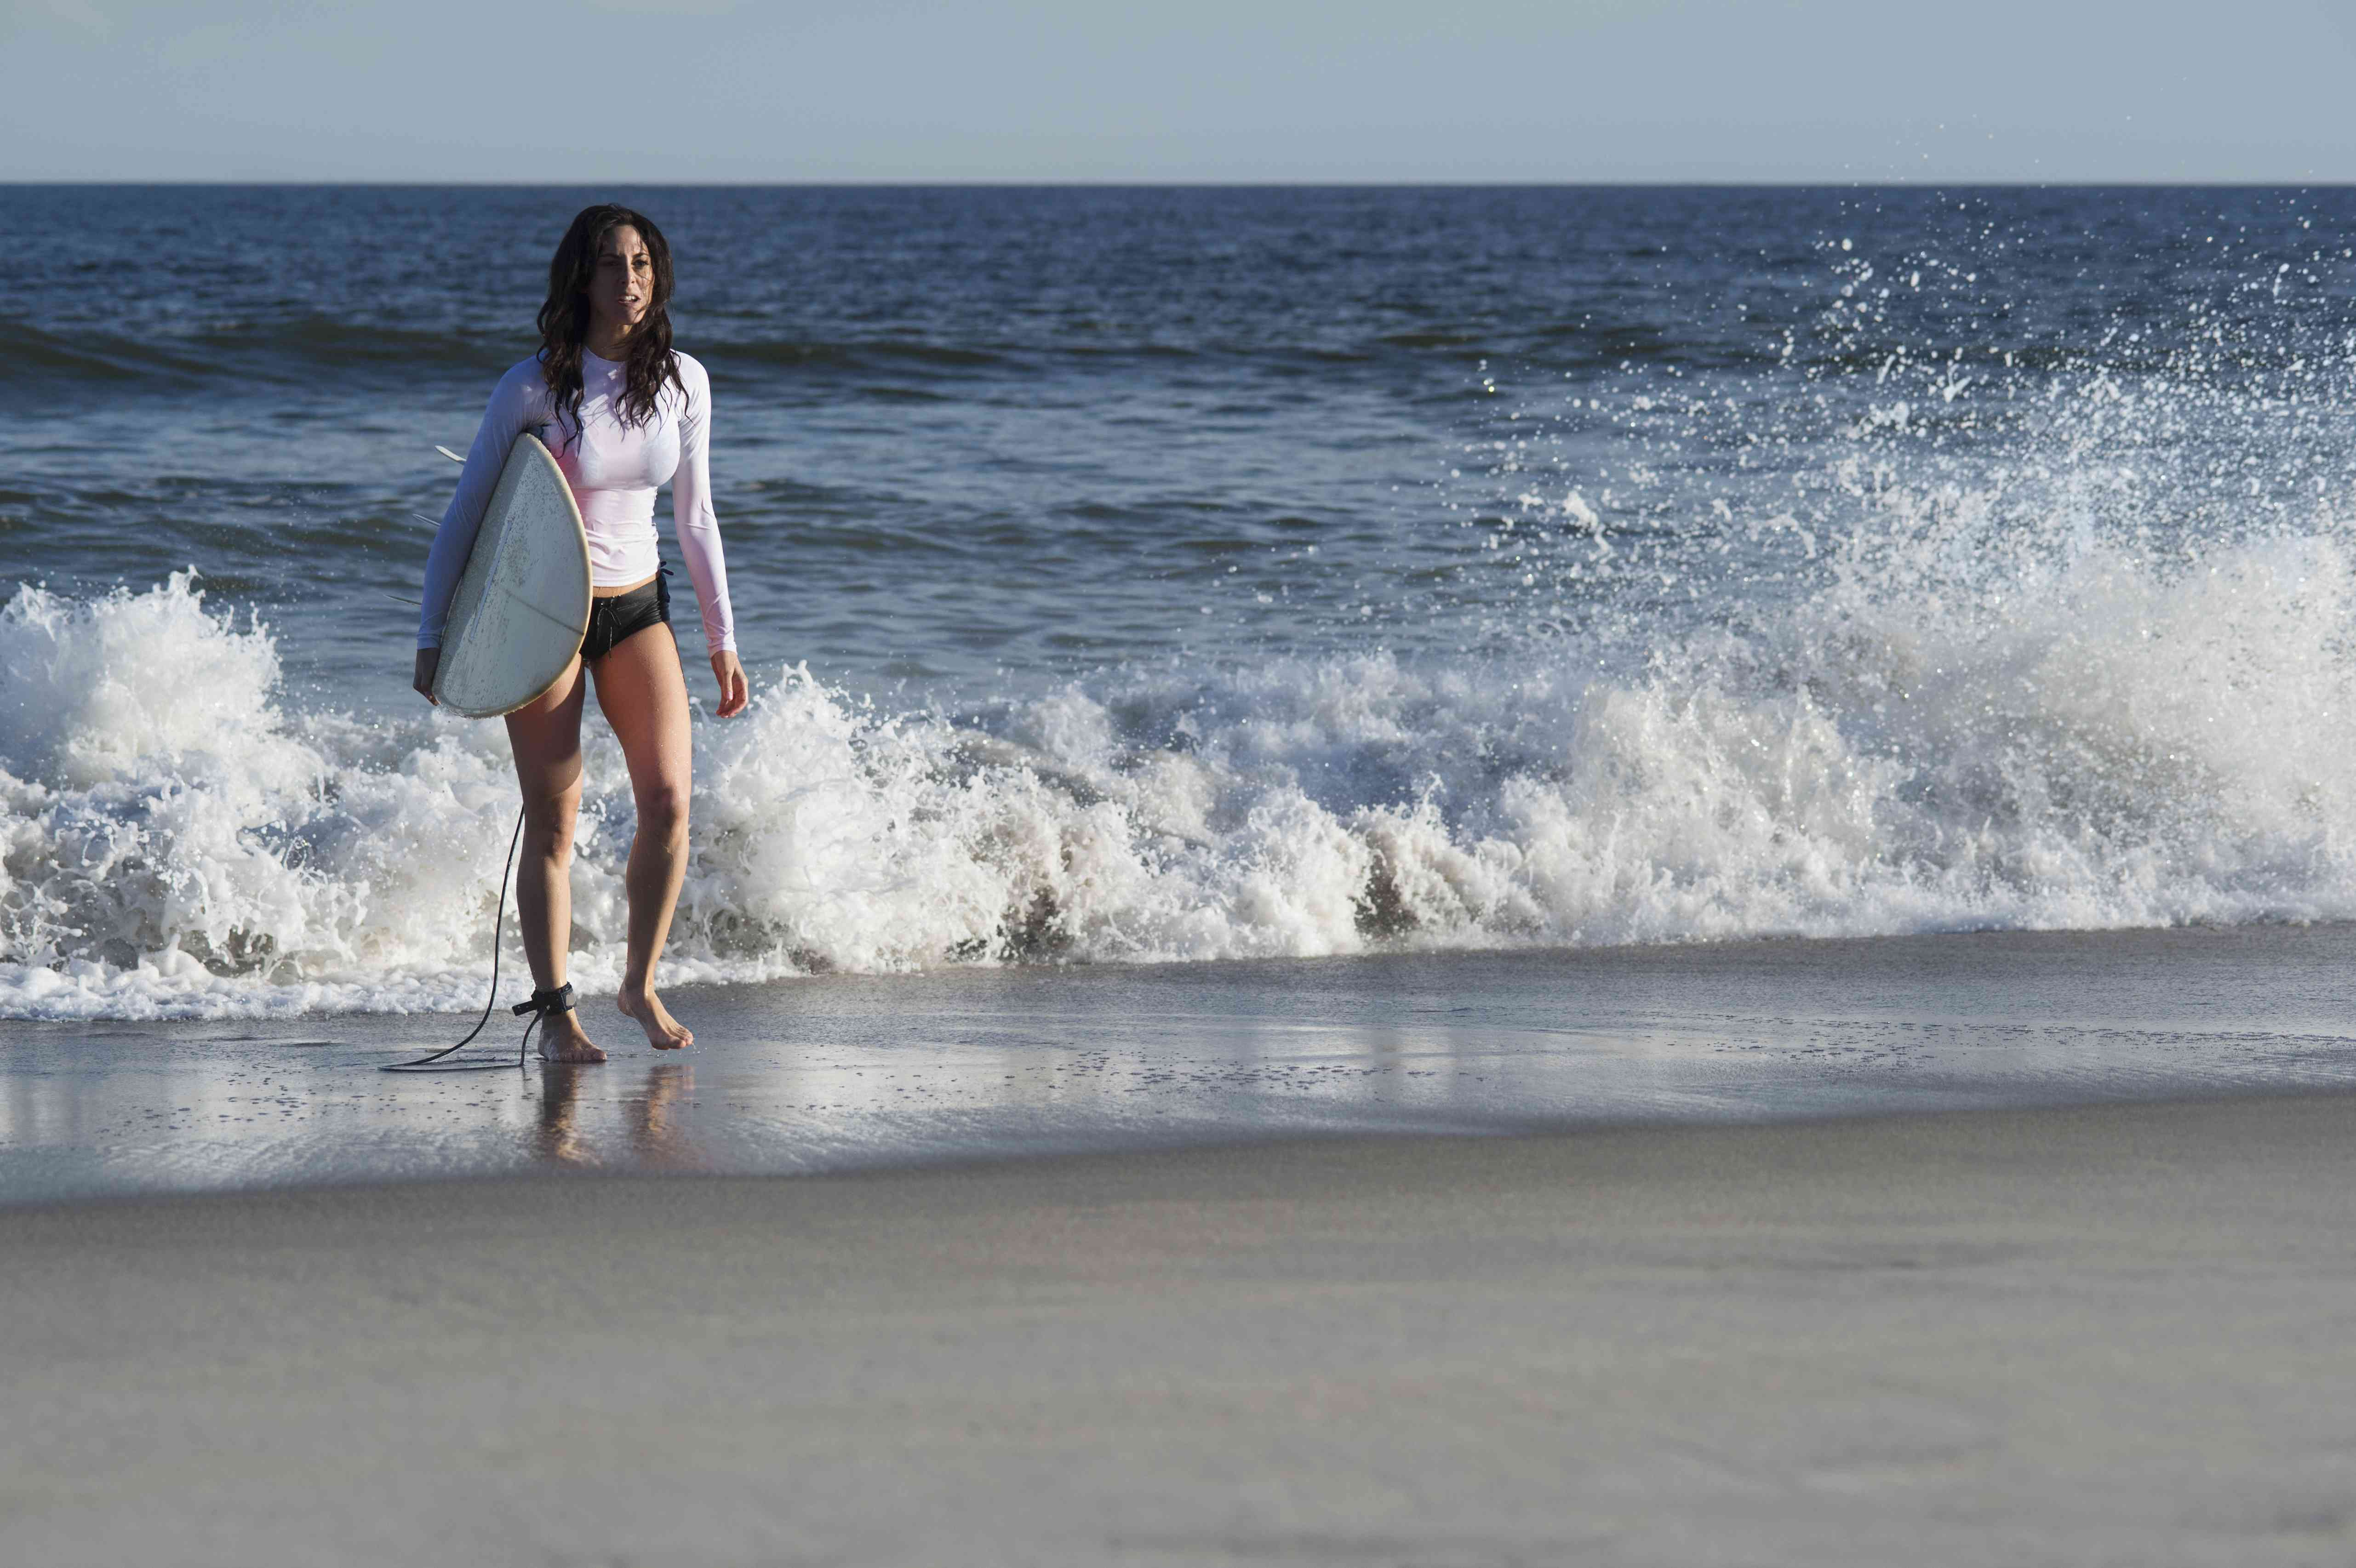 USA, New York State, Rockaway Beach, Woman carrying surfboard on beach